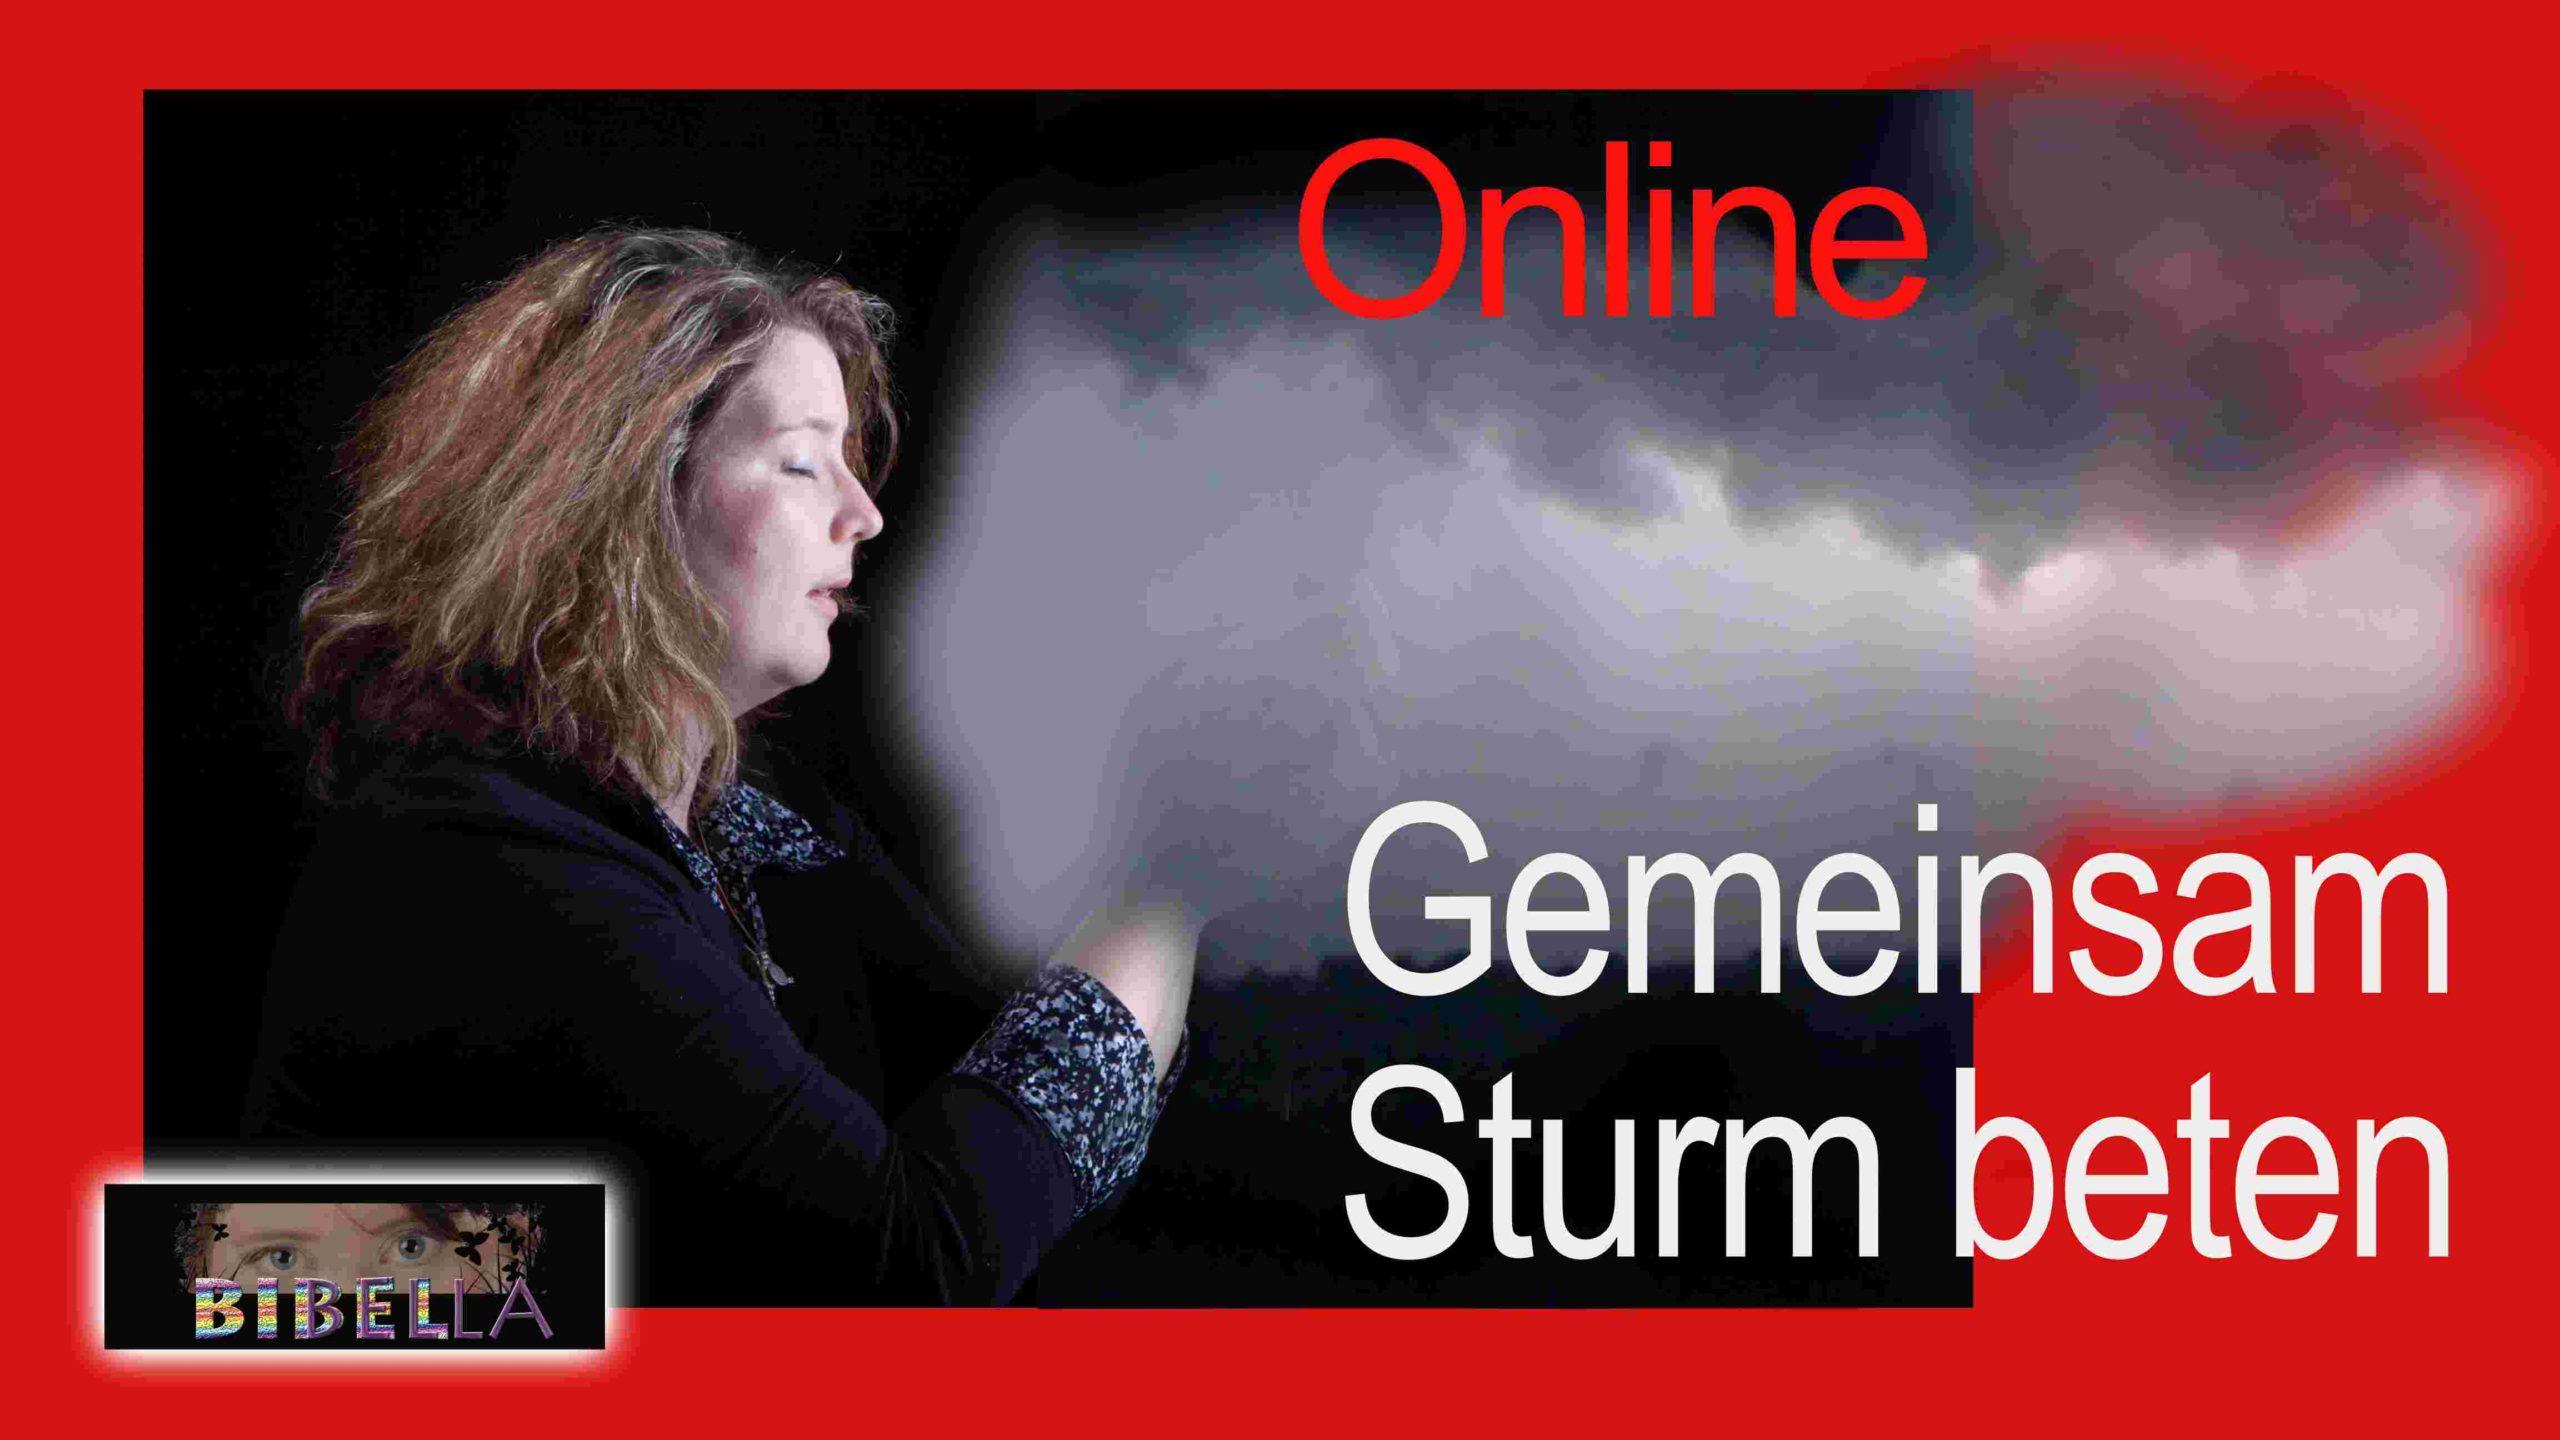 Gemeinsam Sturm beten